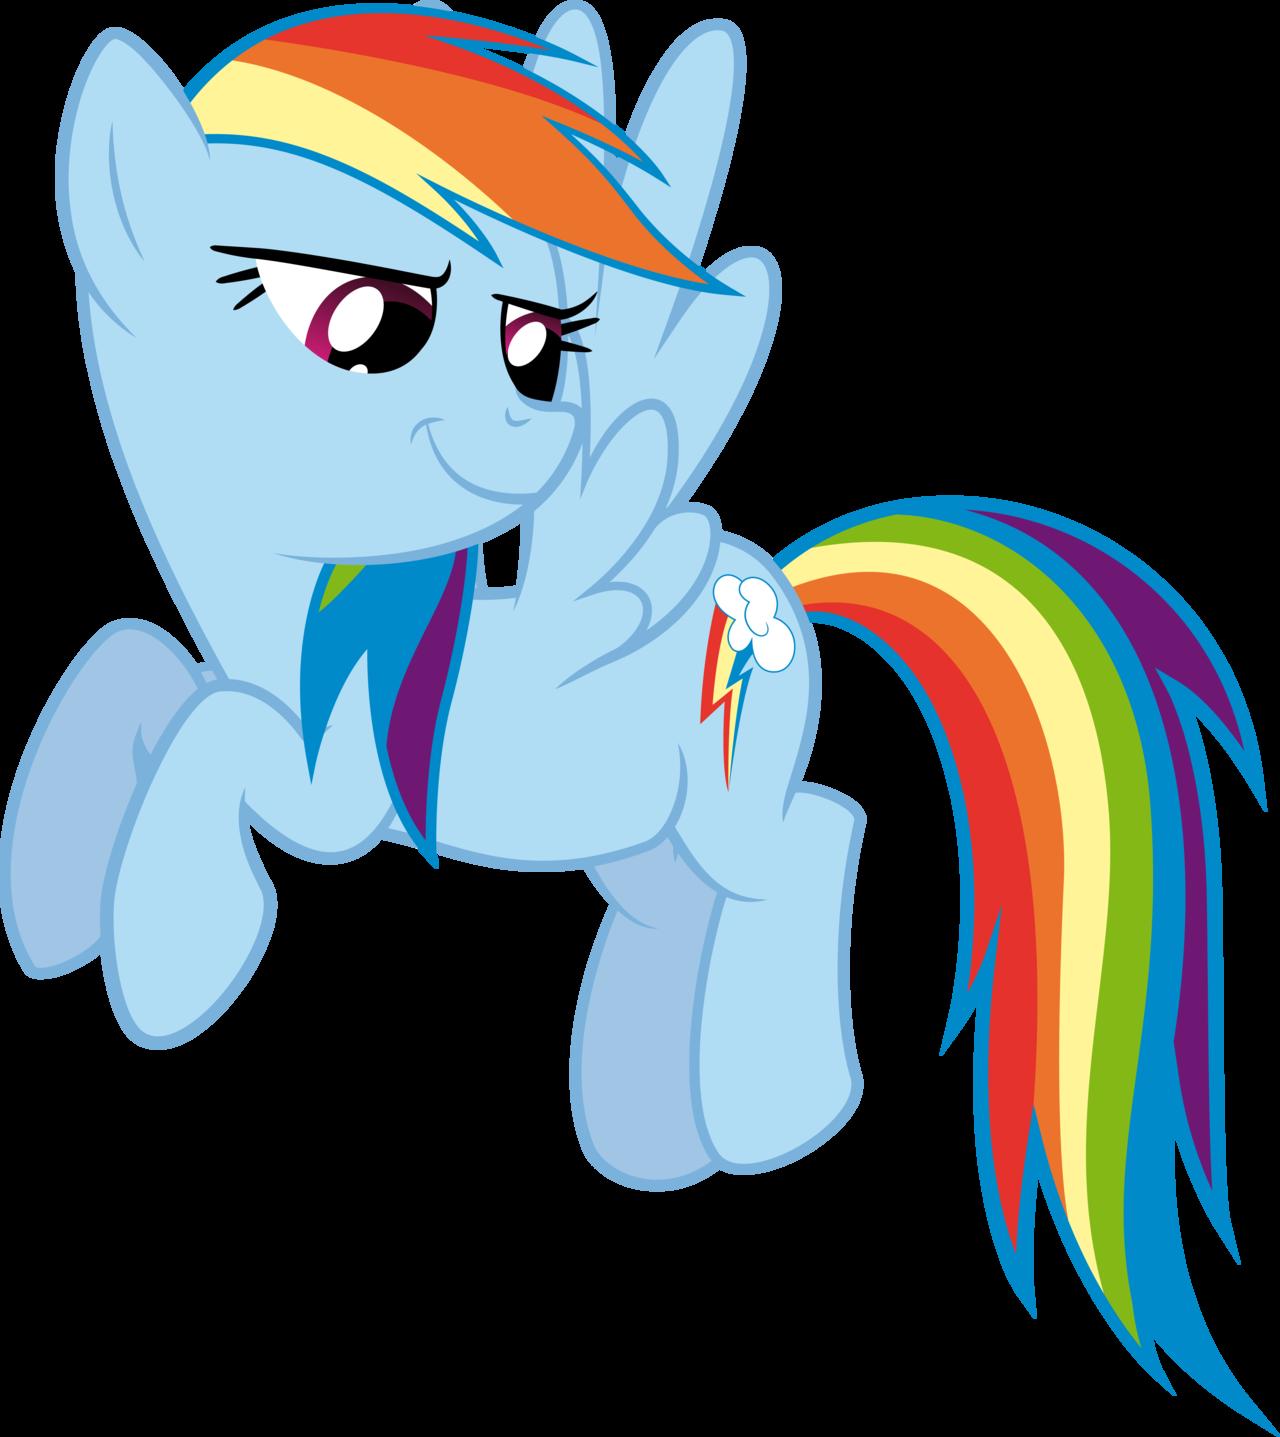 Smirking Rainbow Dash By Redpandapony Deviantart Com On